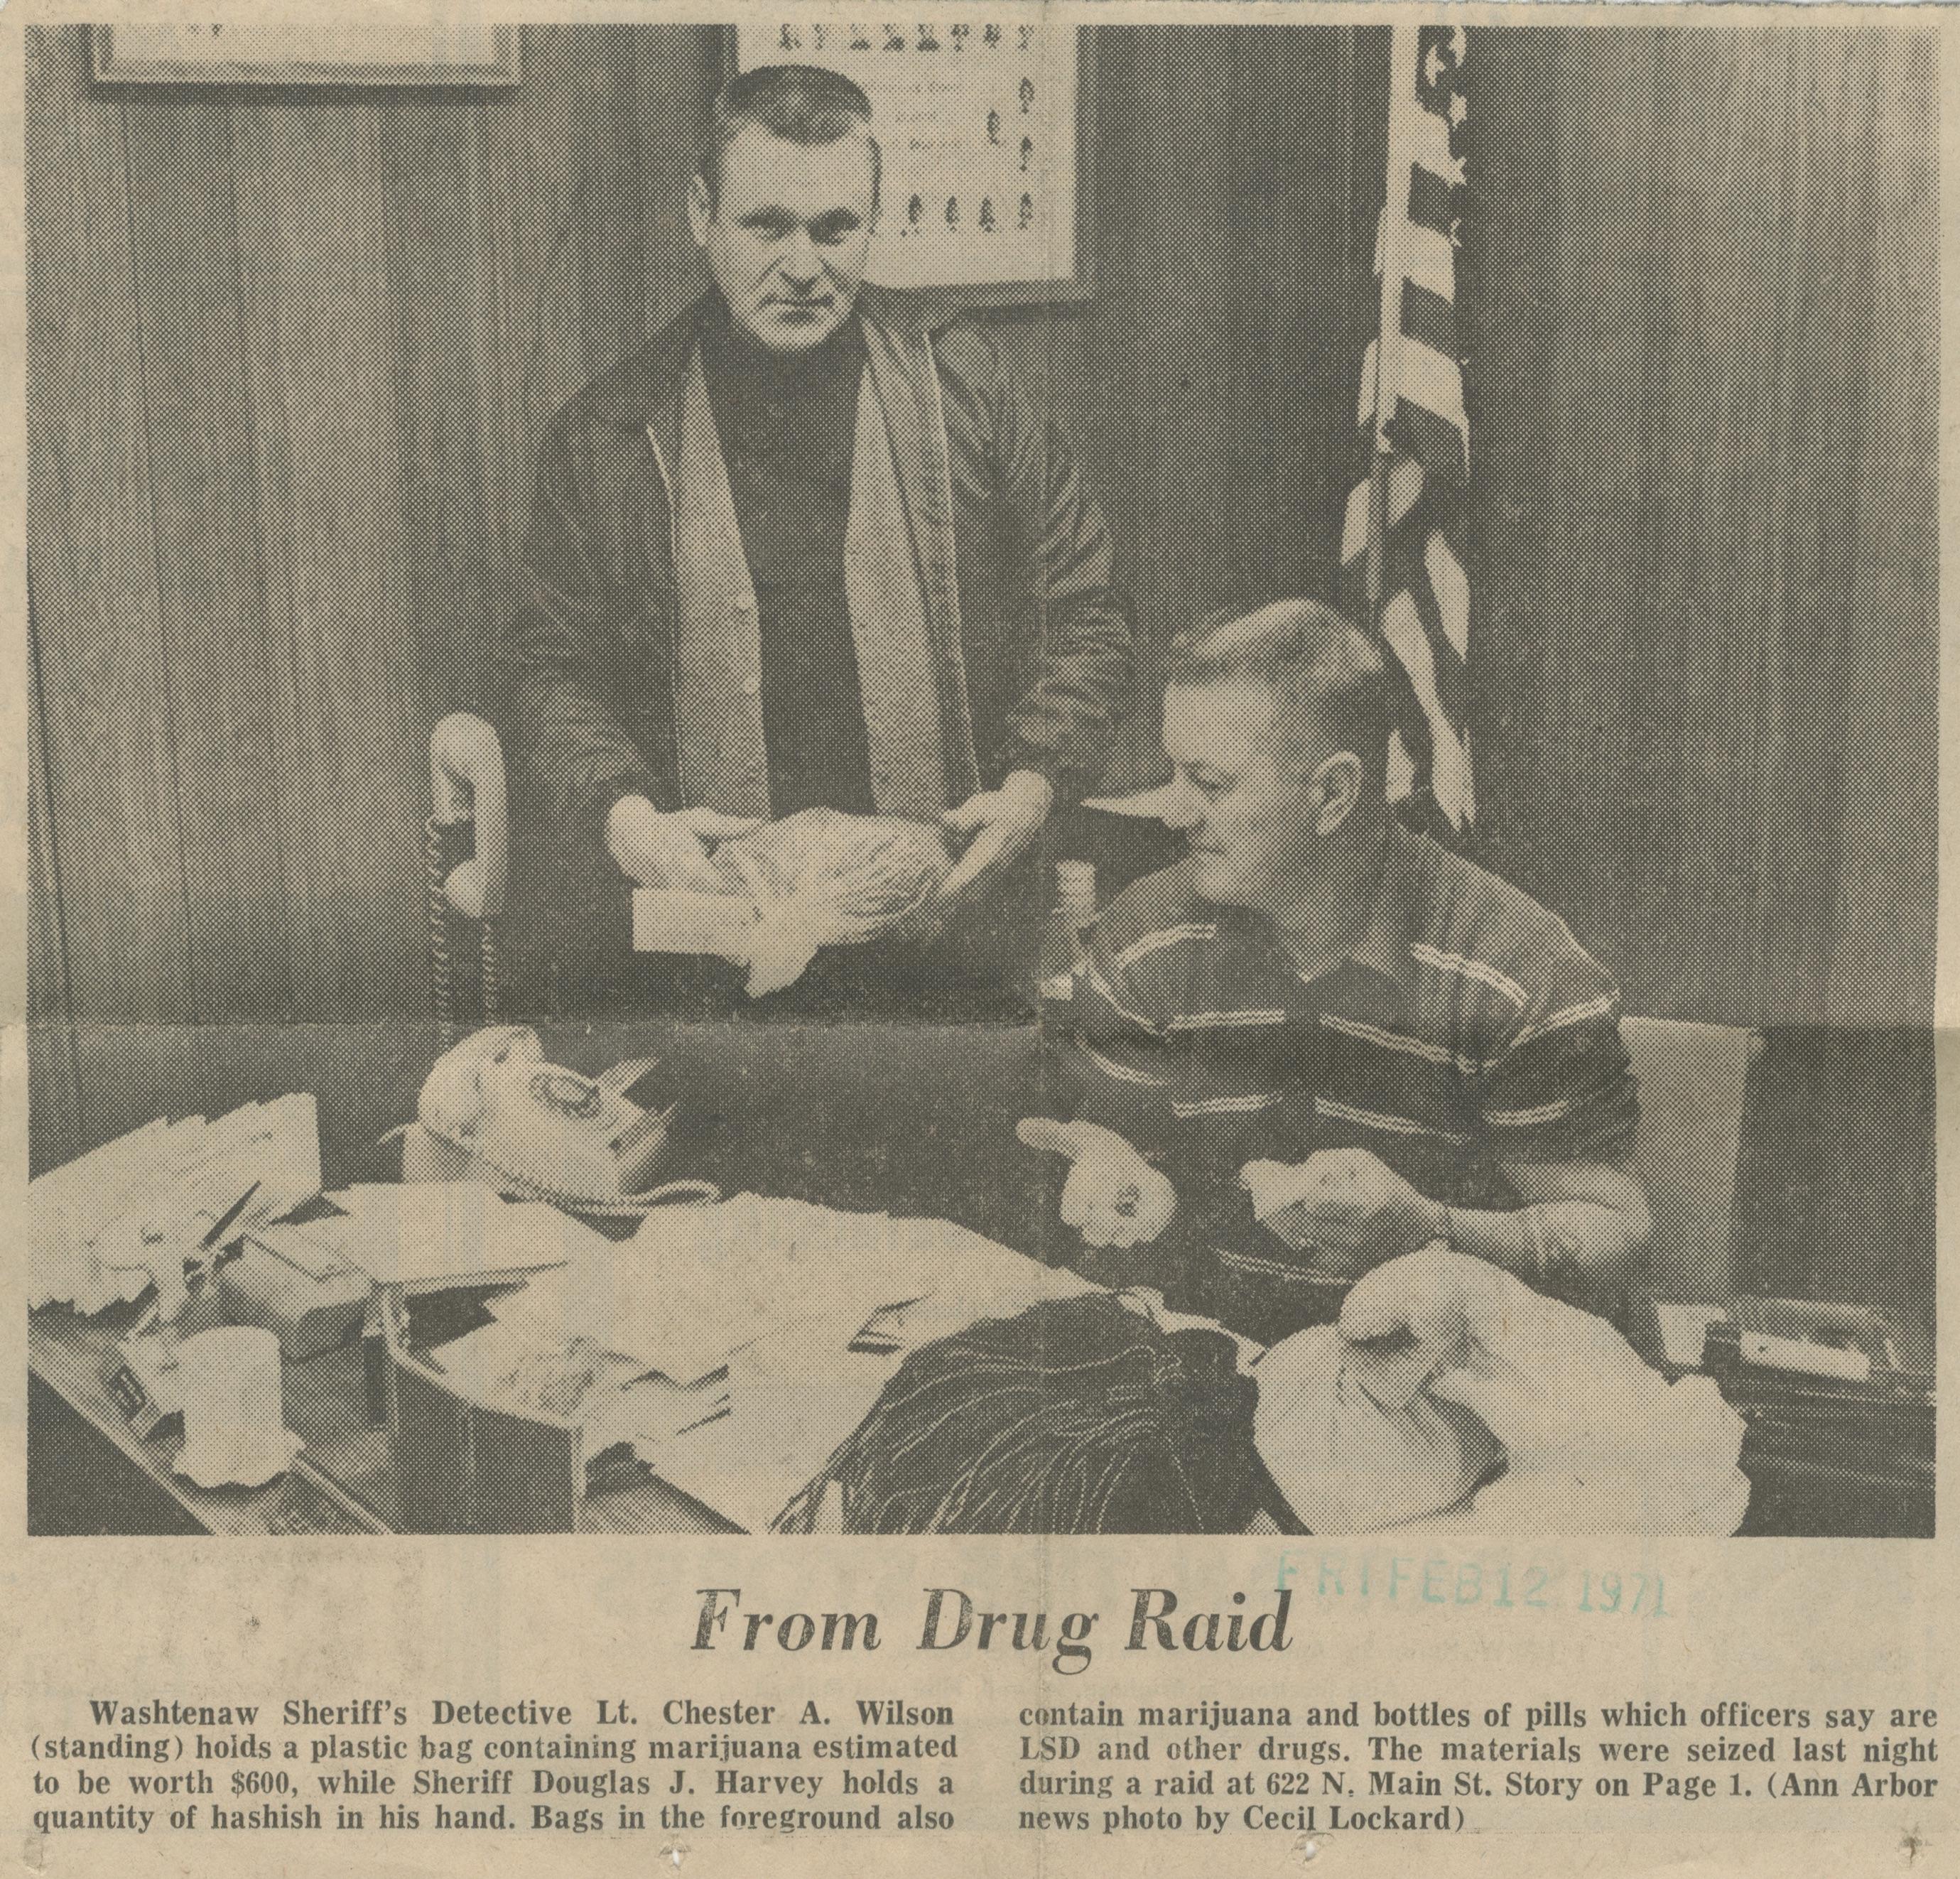 Wayne, Washtenaw Deputies Stage Drug Raid In City | Ann Arbor